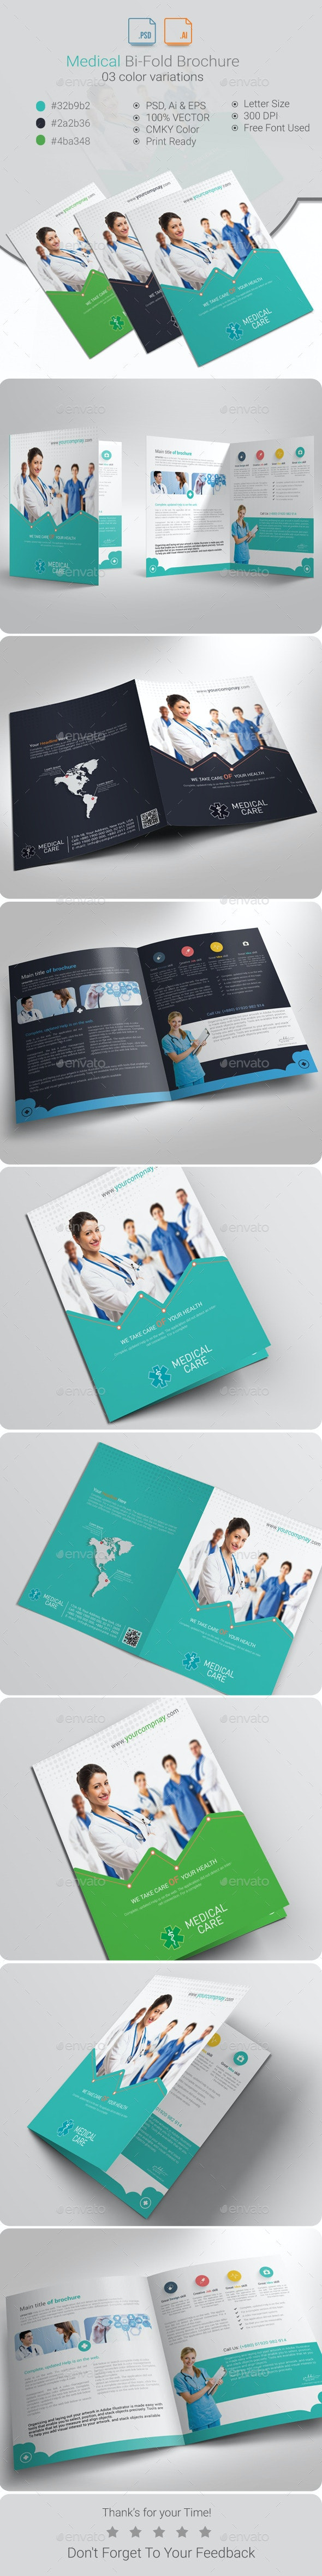 Medical Bi-Fold Brochure - Corporate Brochures